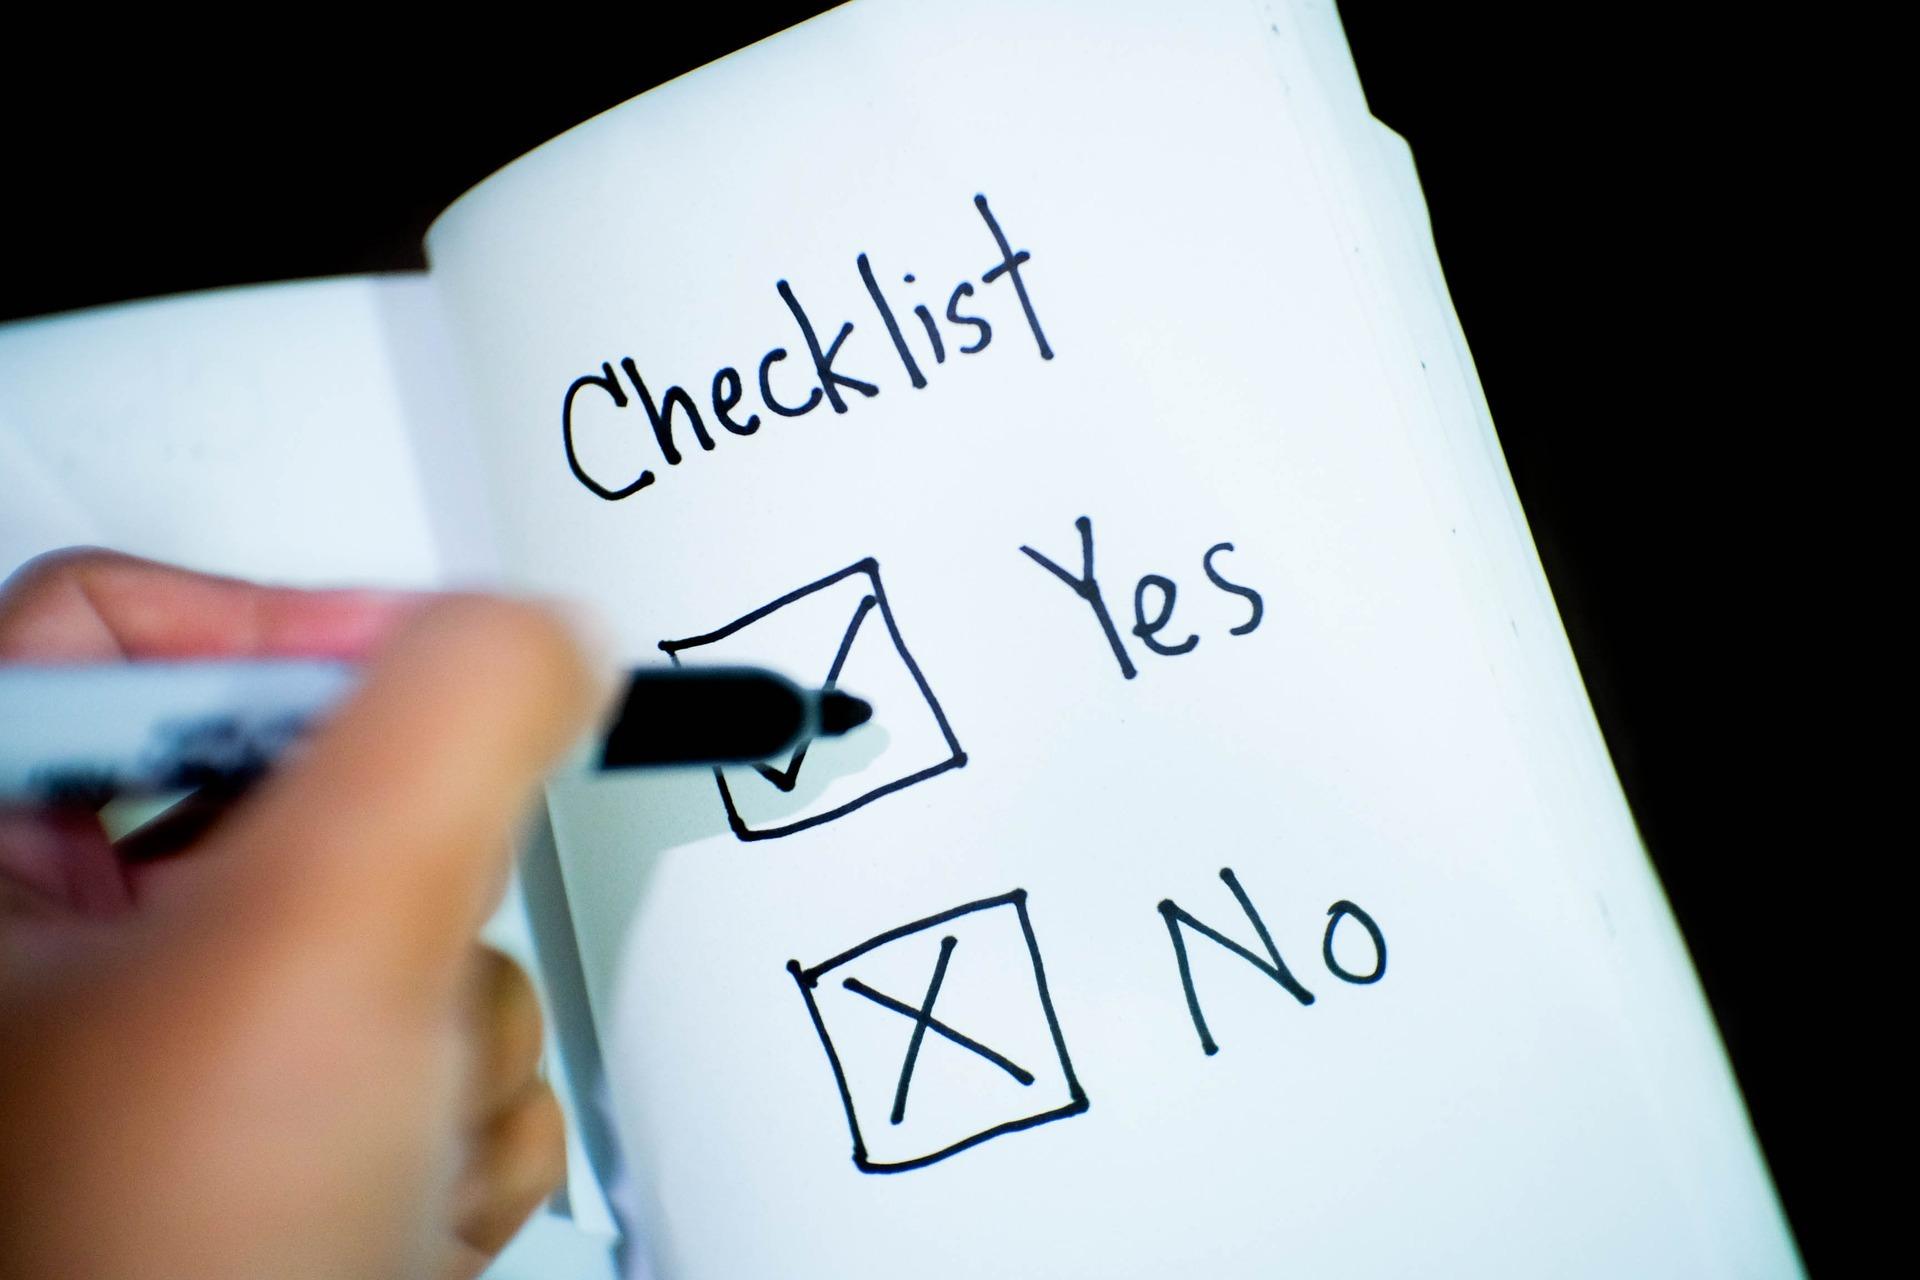 checklist-2313804_1920.jpg